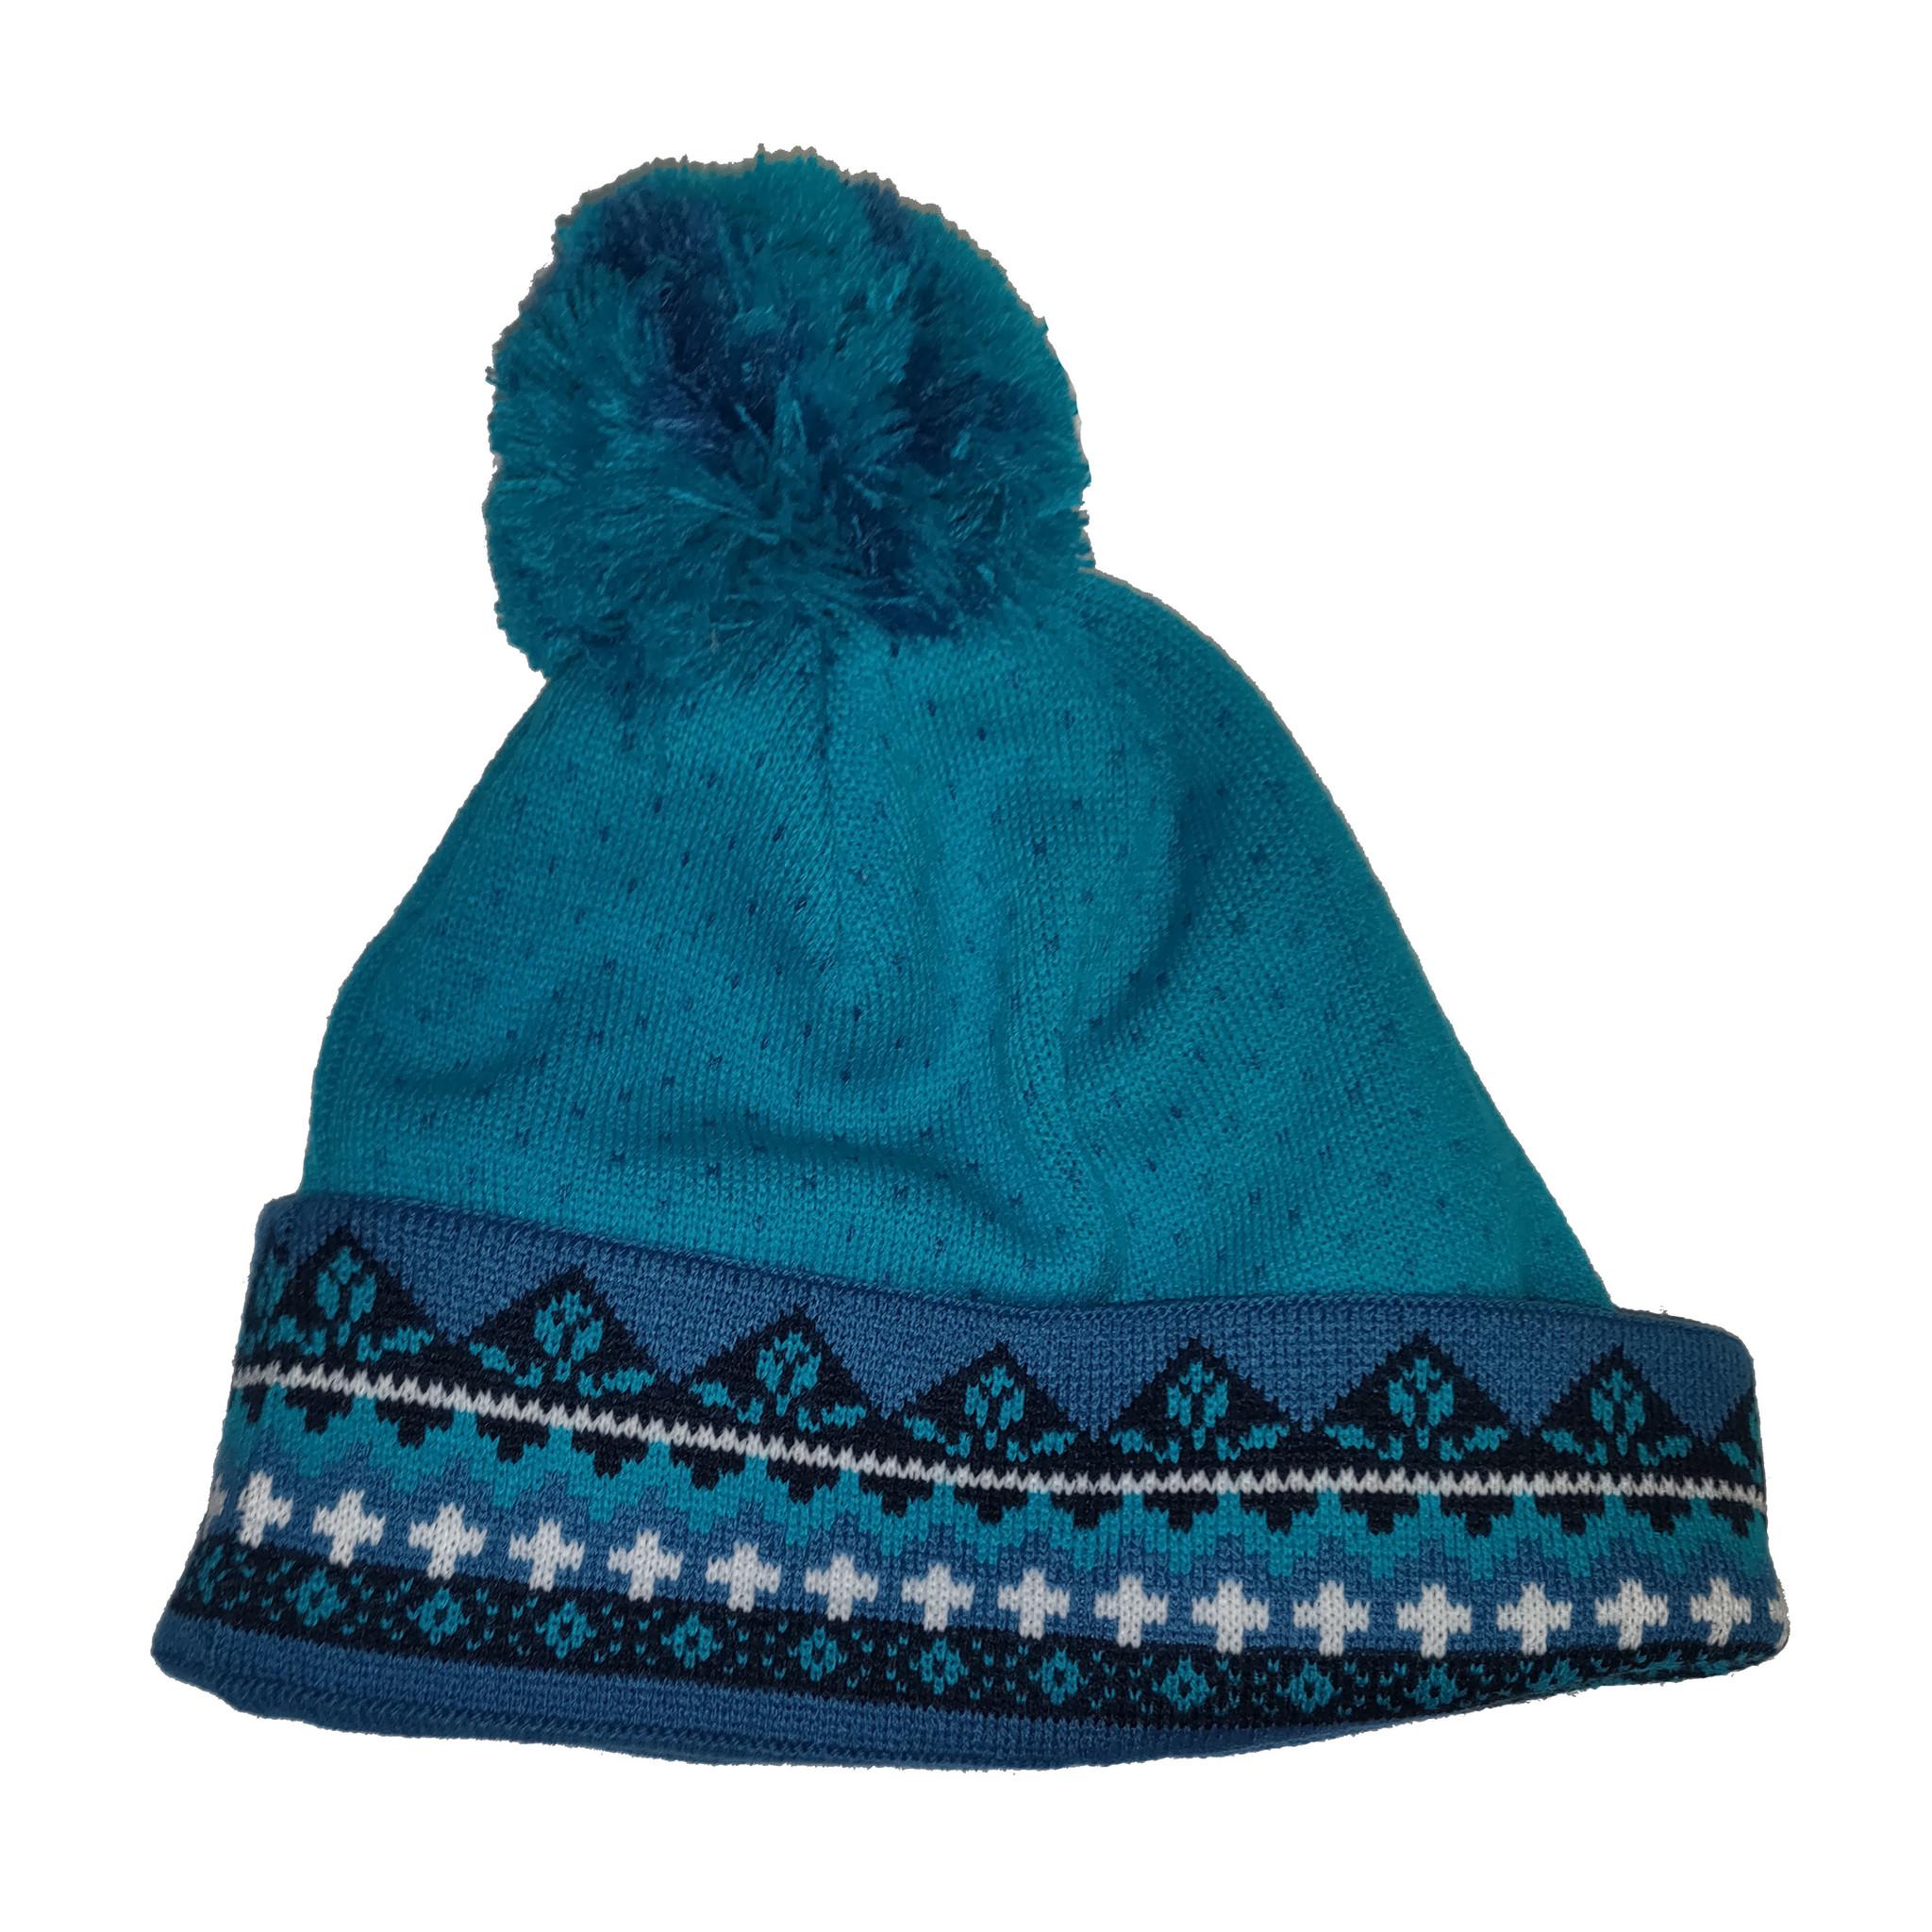 Swix Atwell Hat Turquoise Melange